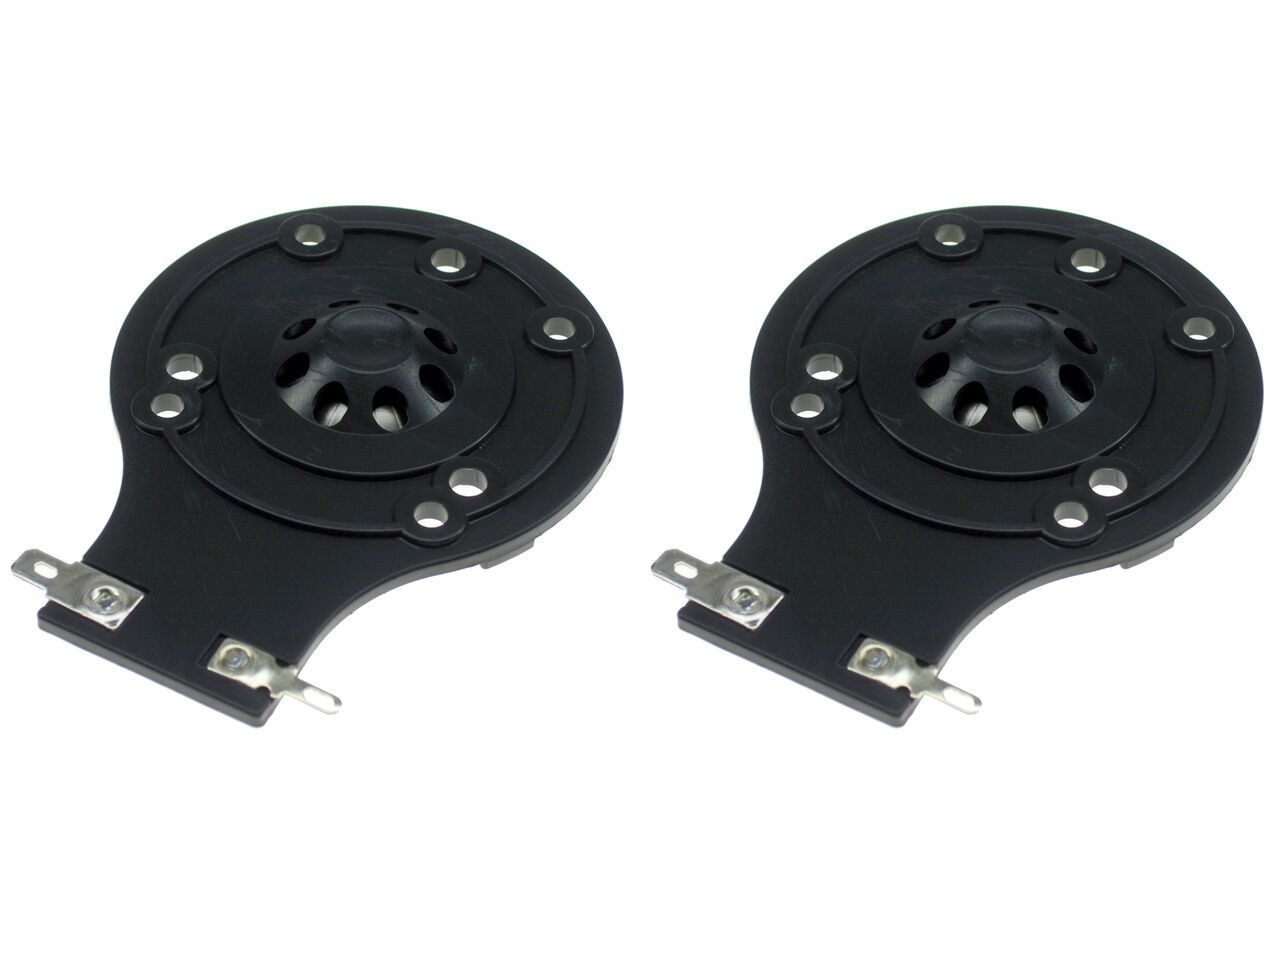 Diaphragma JBL Mpro MP212 MP225 MP410 Kontrolle 29 2412 Horn Repair Teile 2 Pack